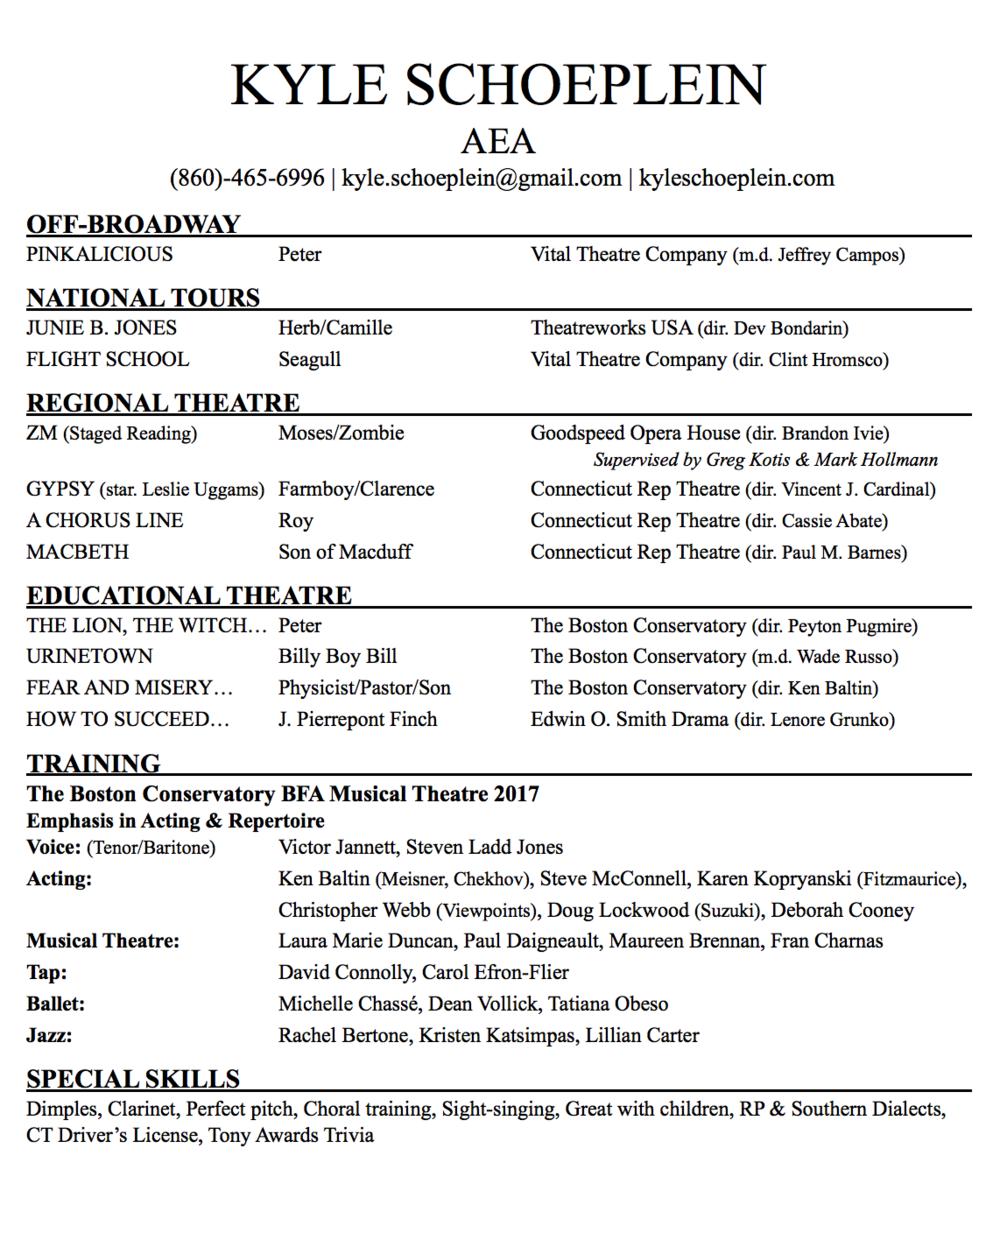 Resume — KYLE SCHOEPLEIN